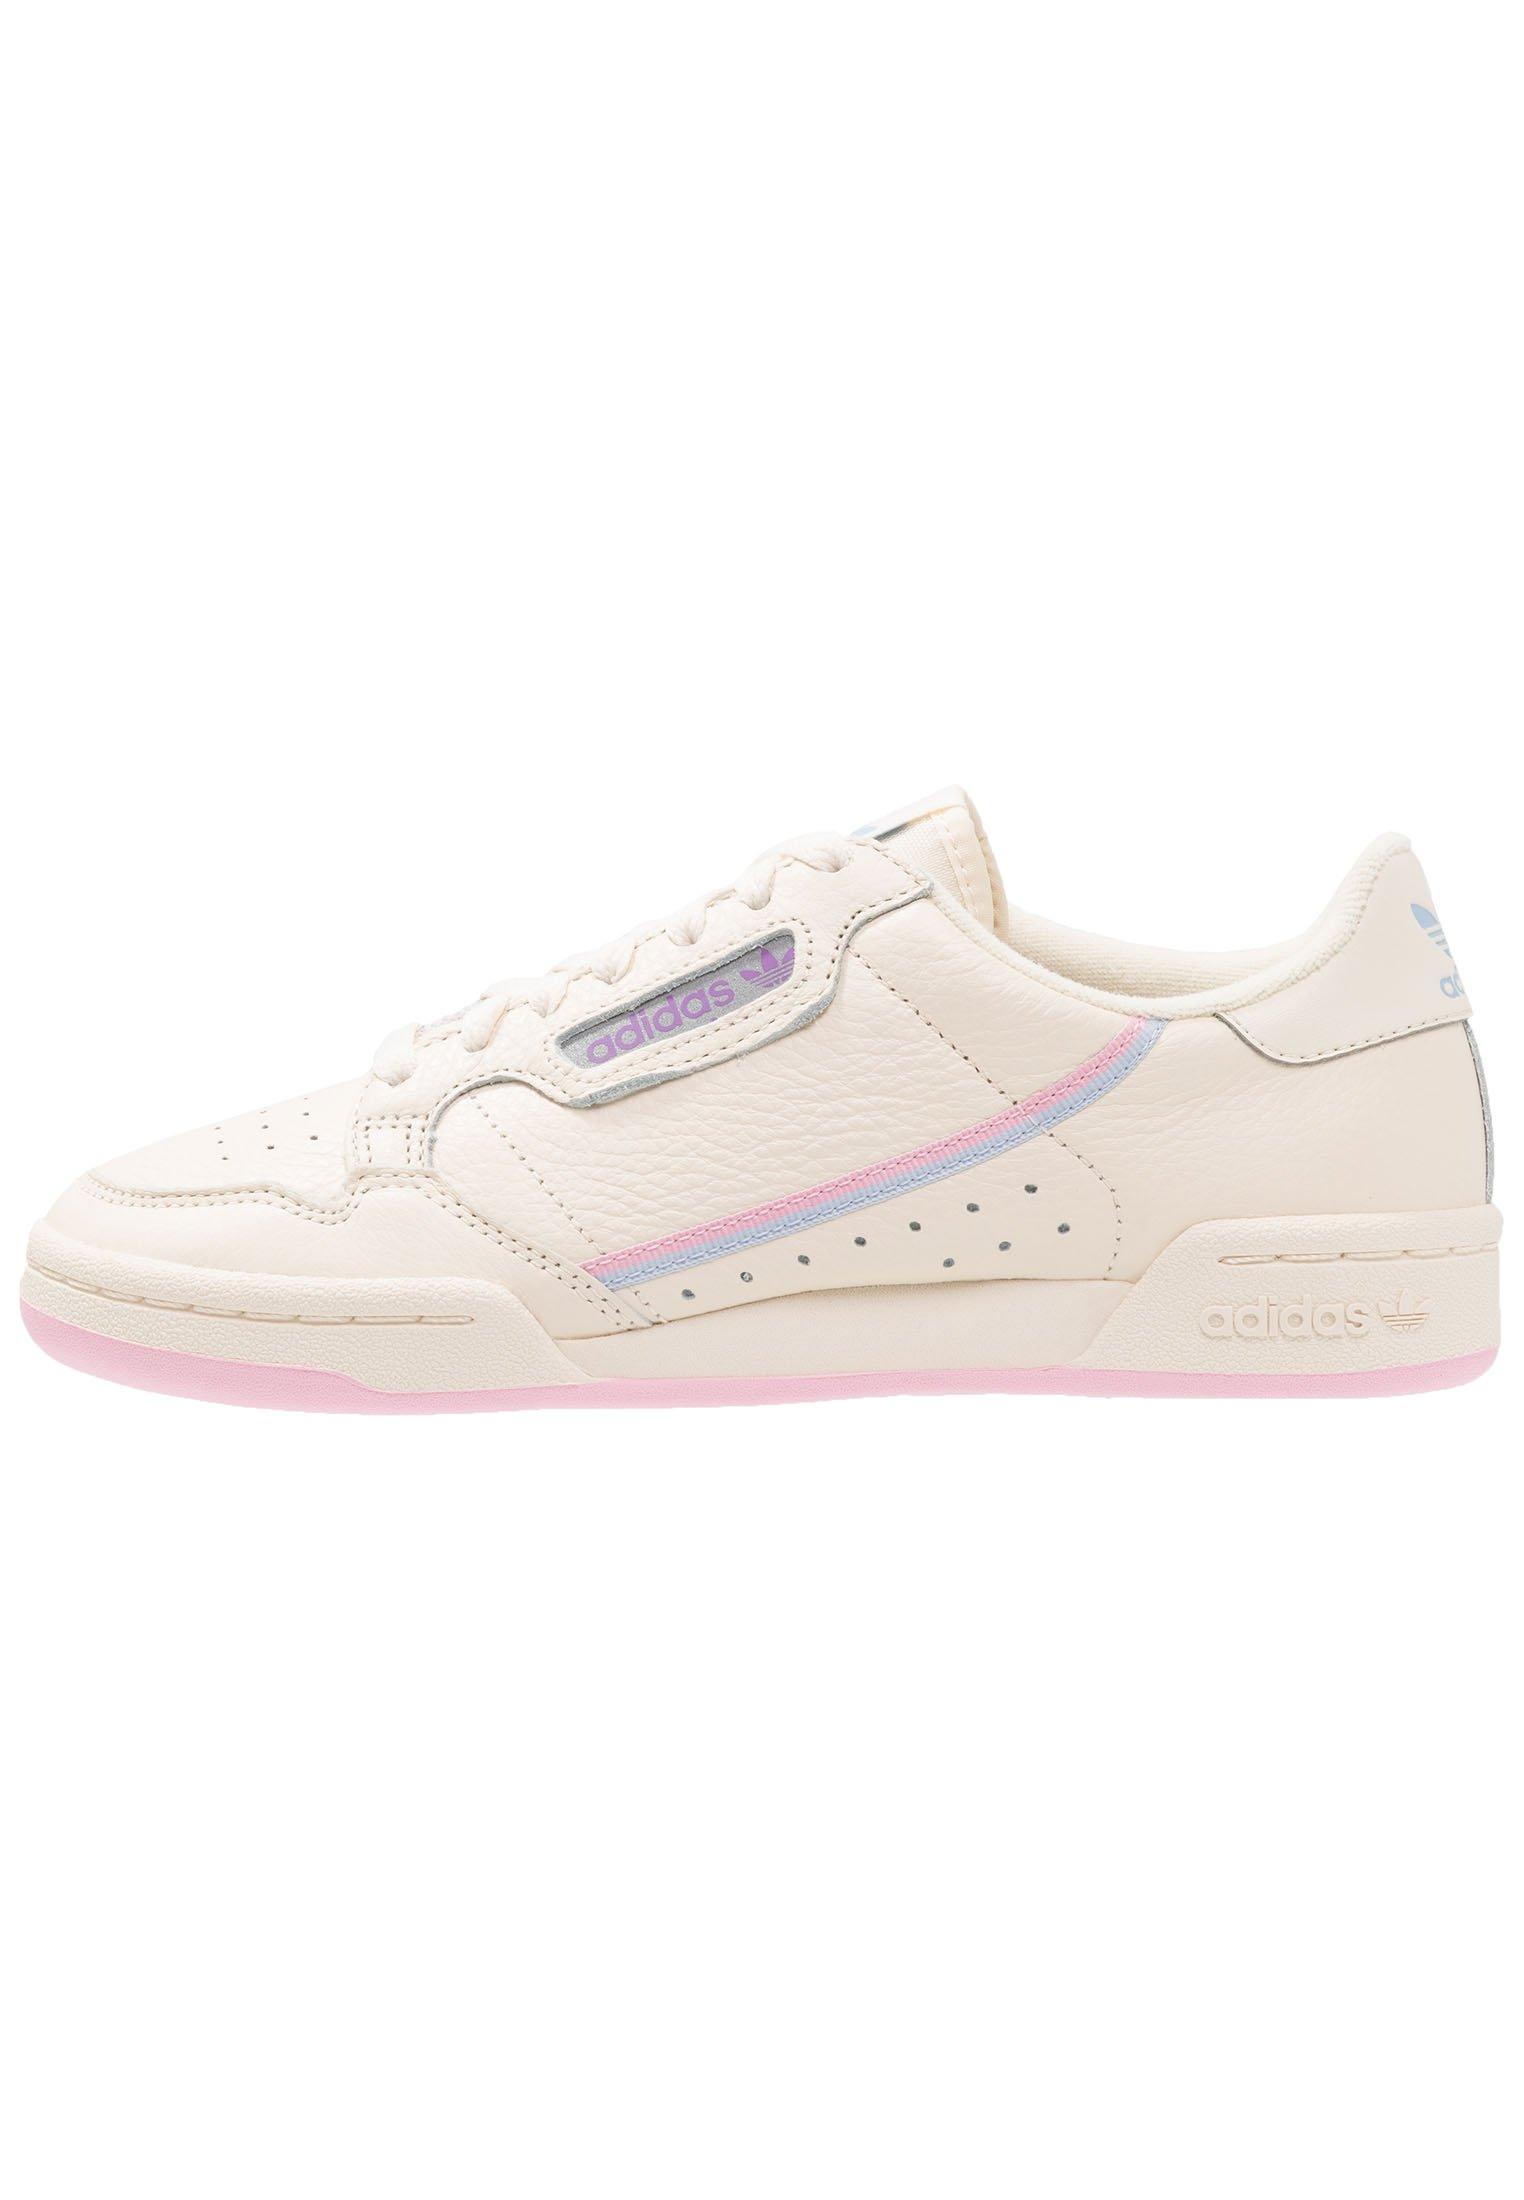 CONTINENTAL 80 - Sneaker low - ecru tint/true pink/periwinkle